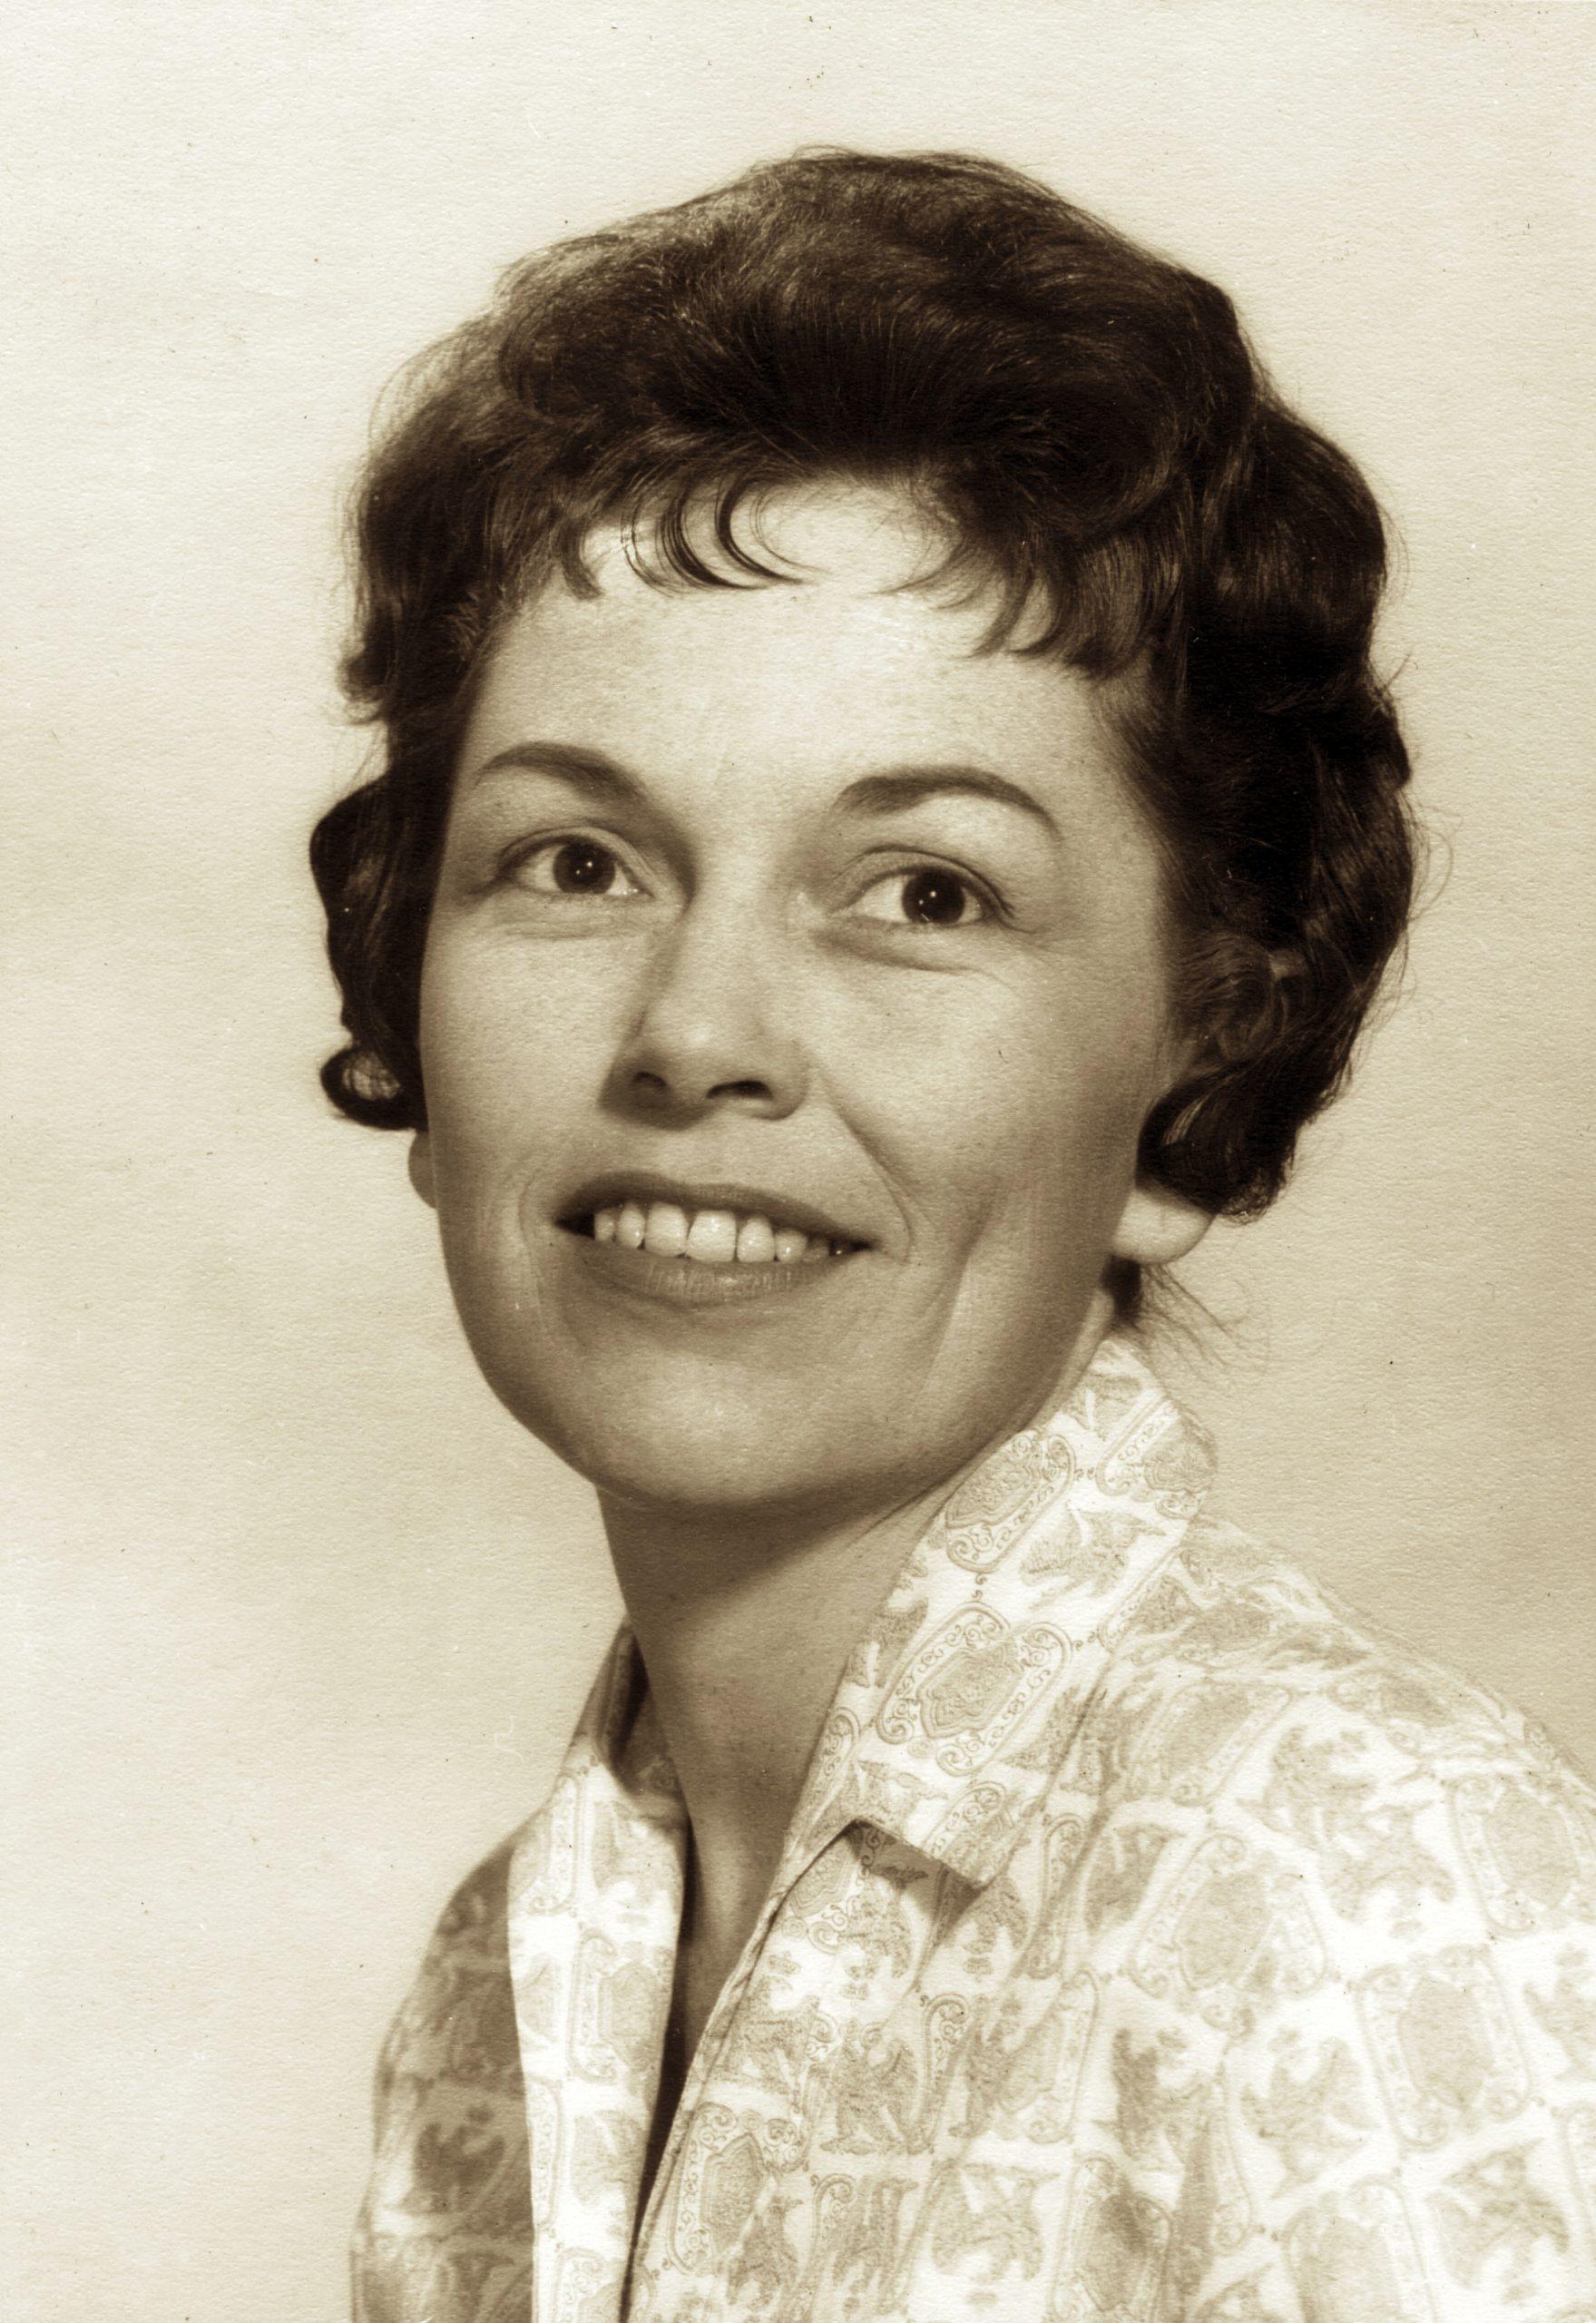 Mary Elizabeth Acridge Pitt – 4/19/1930 – 11/9/2019